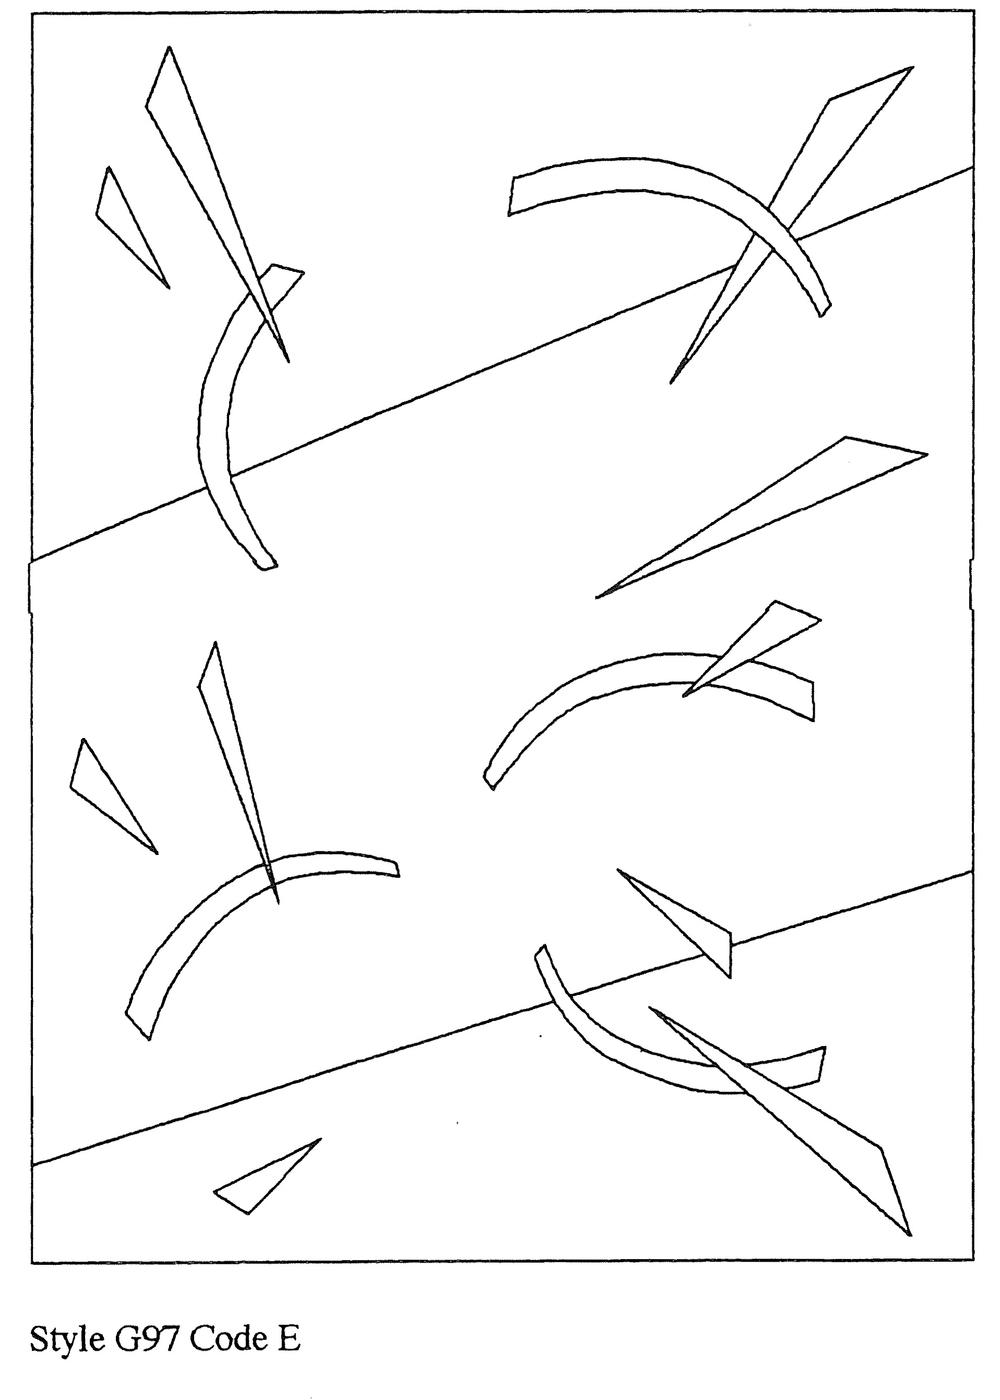 Page 14 copy 2.jpg